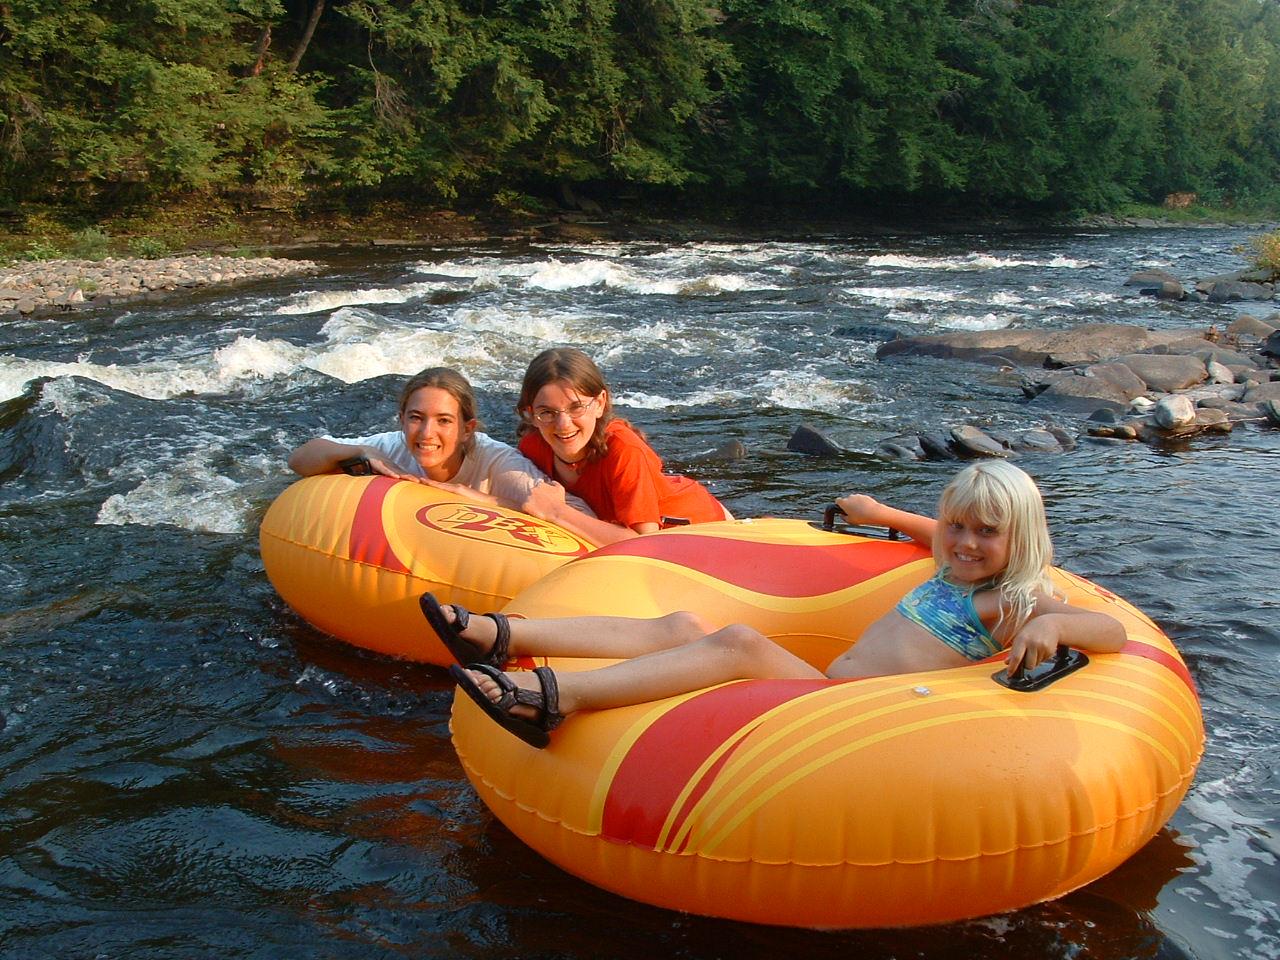 Wellnesste Lodge- River Tubing Fun